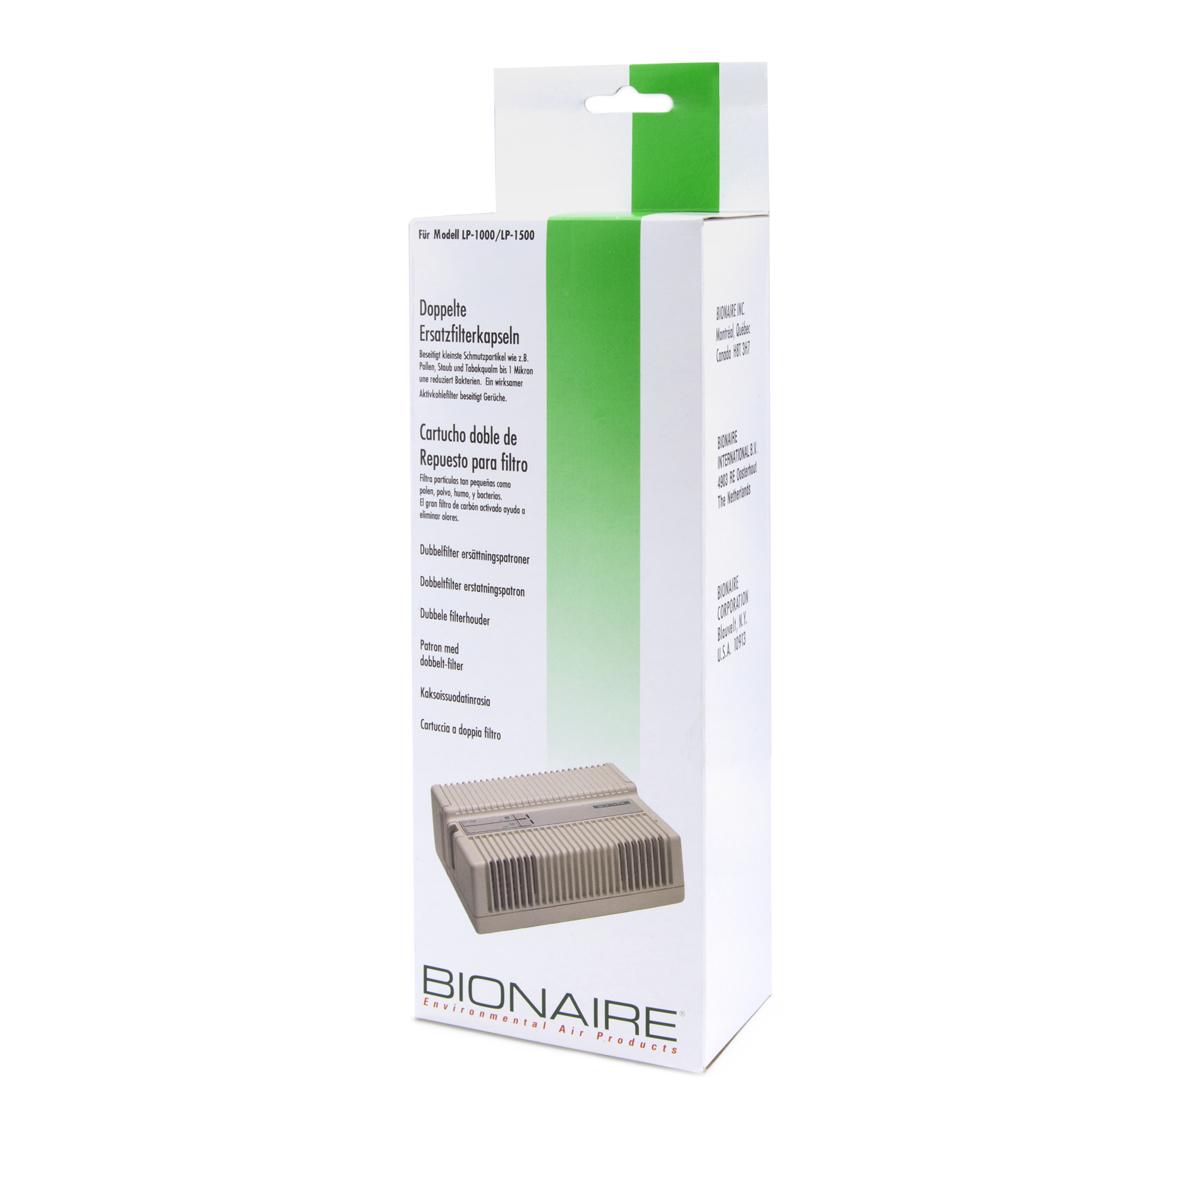 Bionaire® Dual Air Purifier Filter 611D X Bionaire® Canada #3E9833